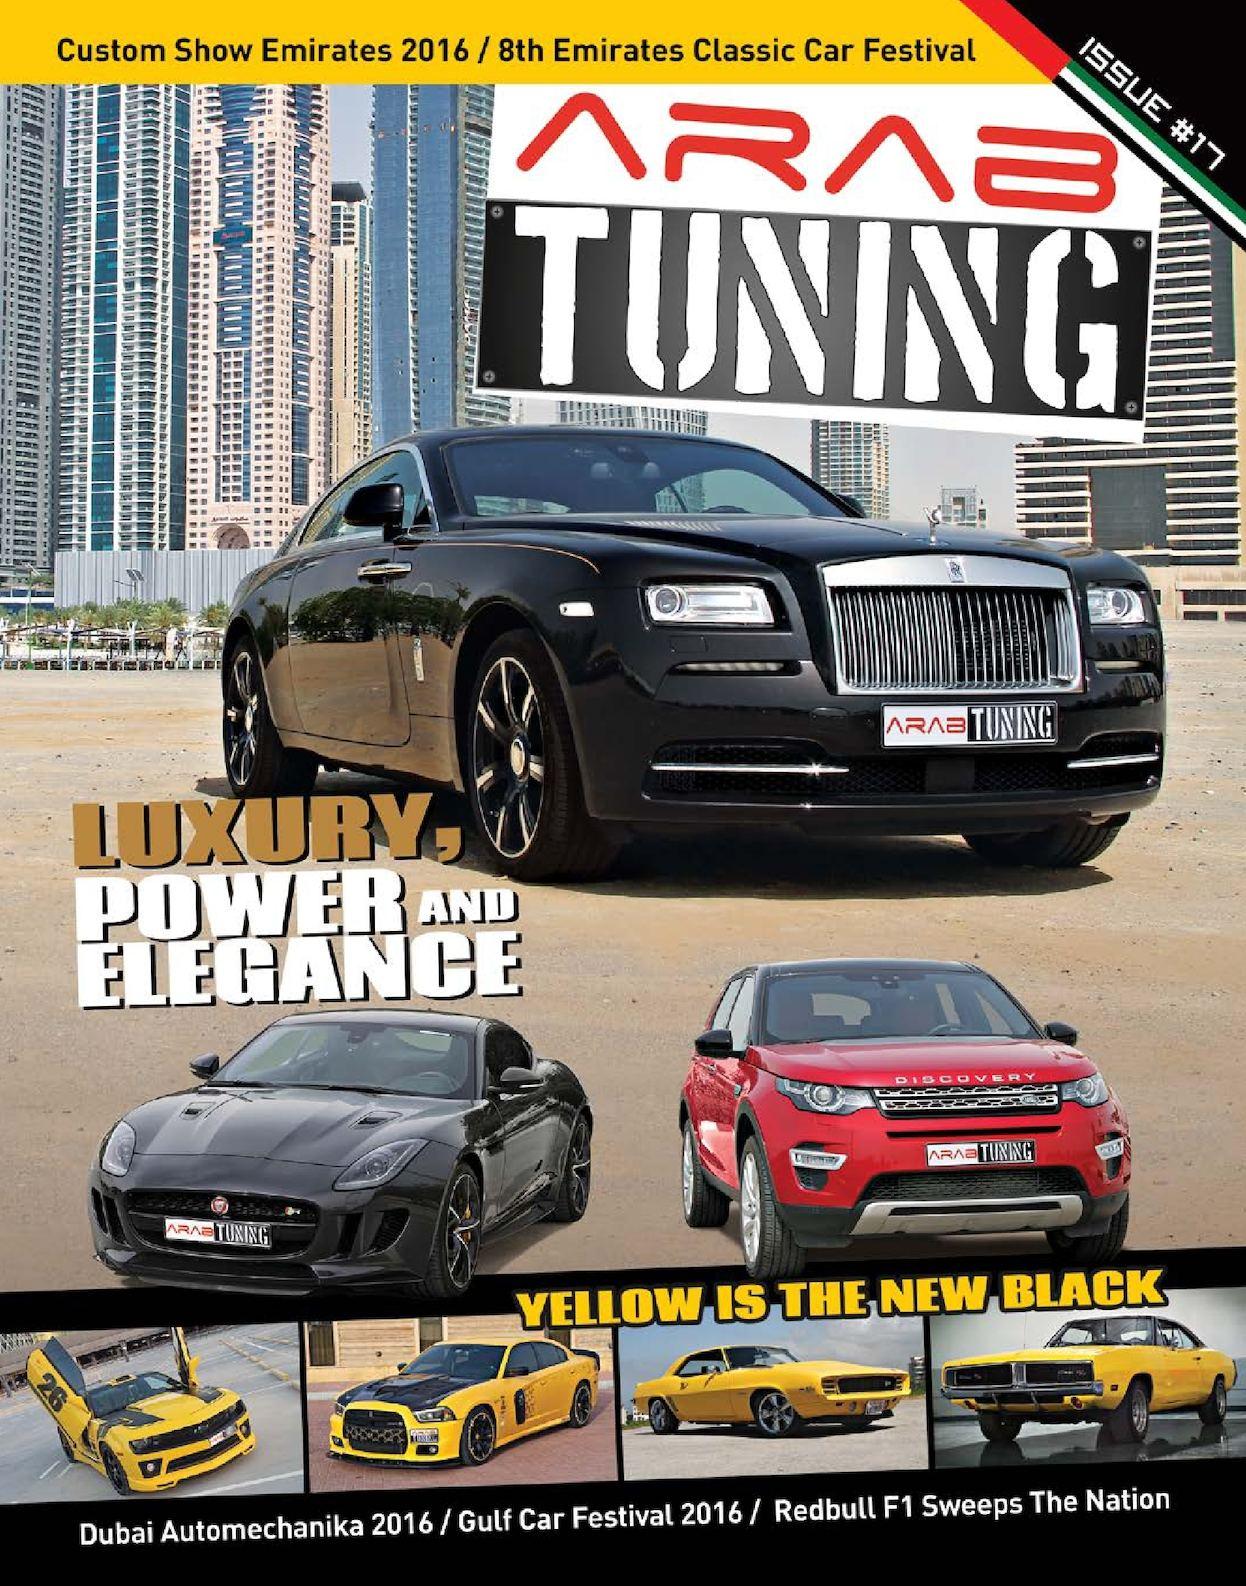 Calaméo - Arab Tuning Issue Magazine #17 UAE Edition